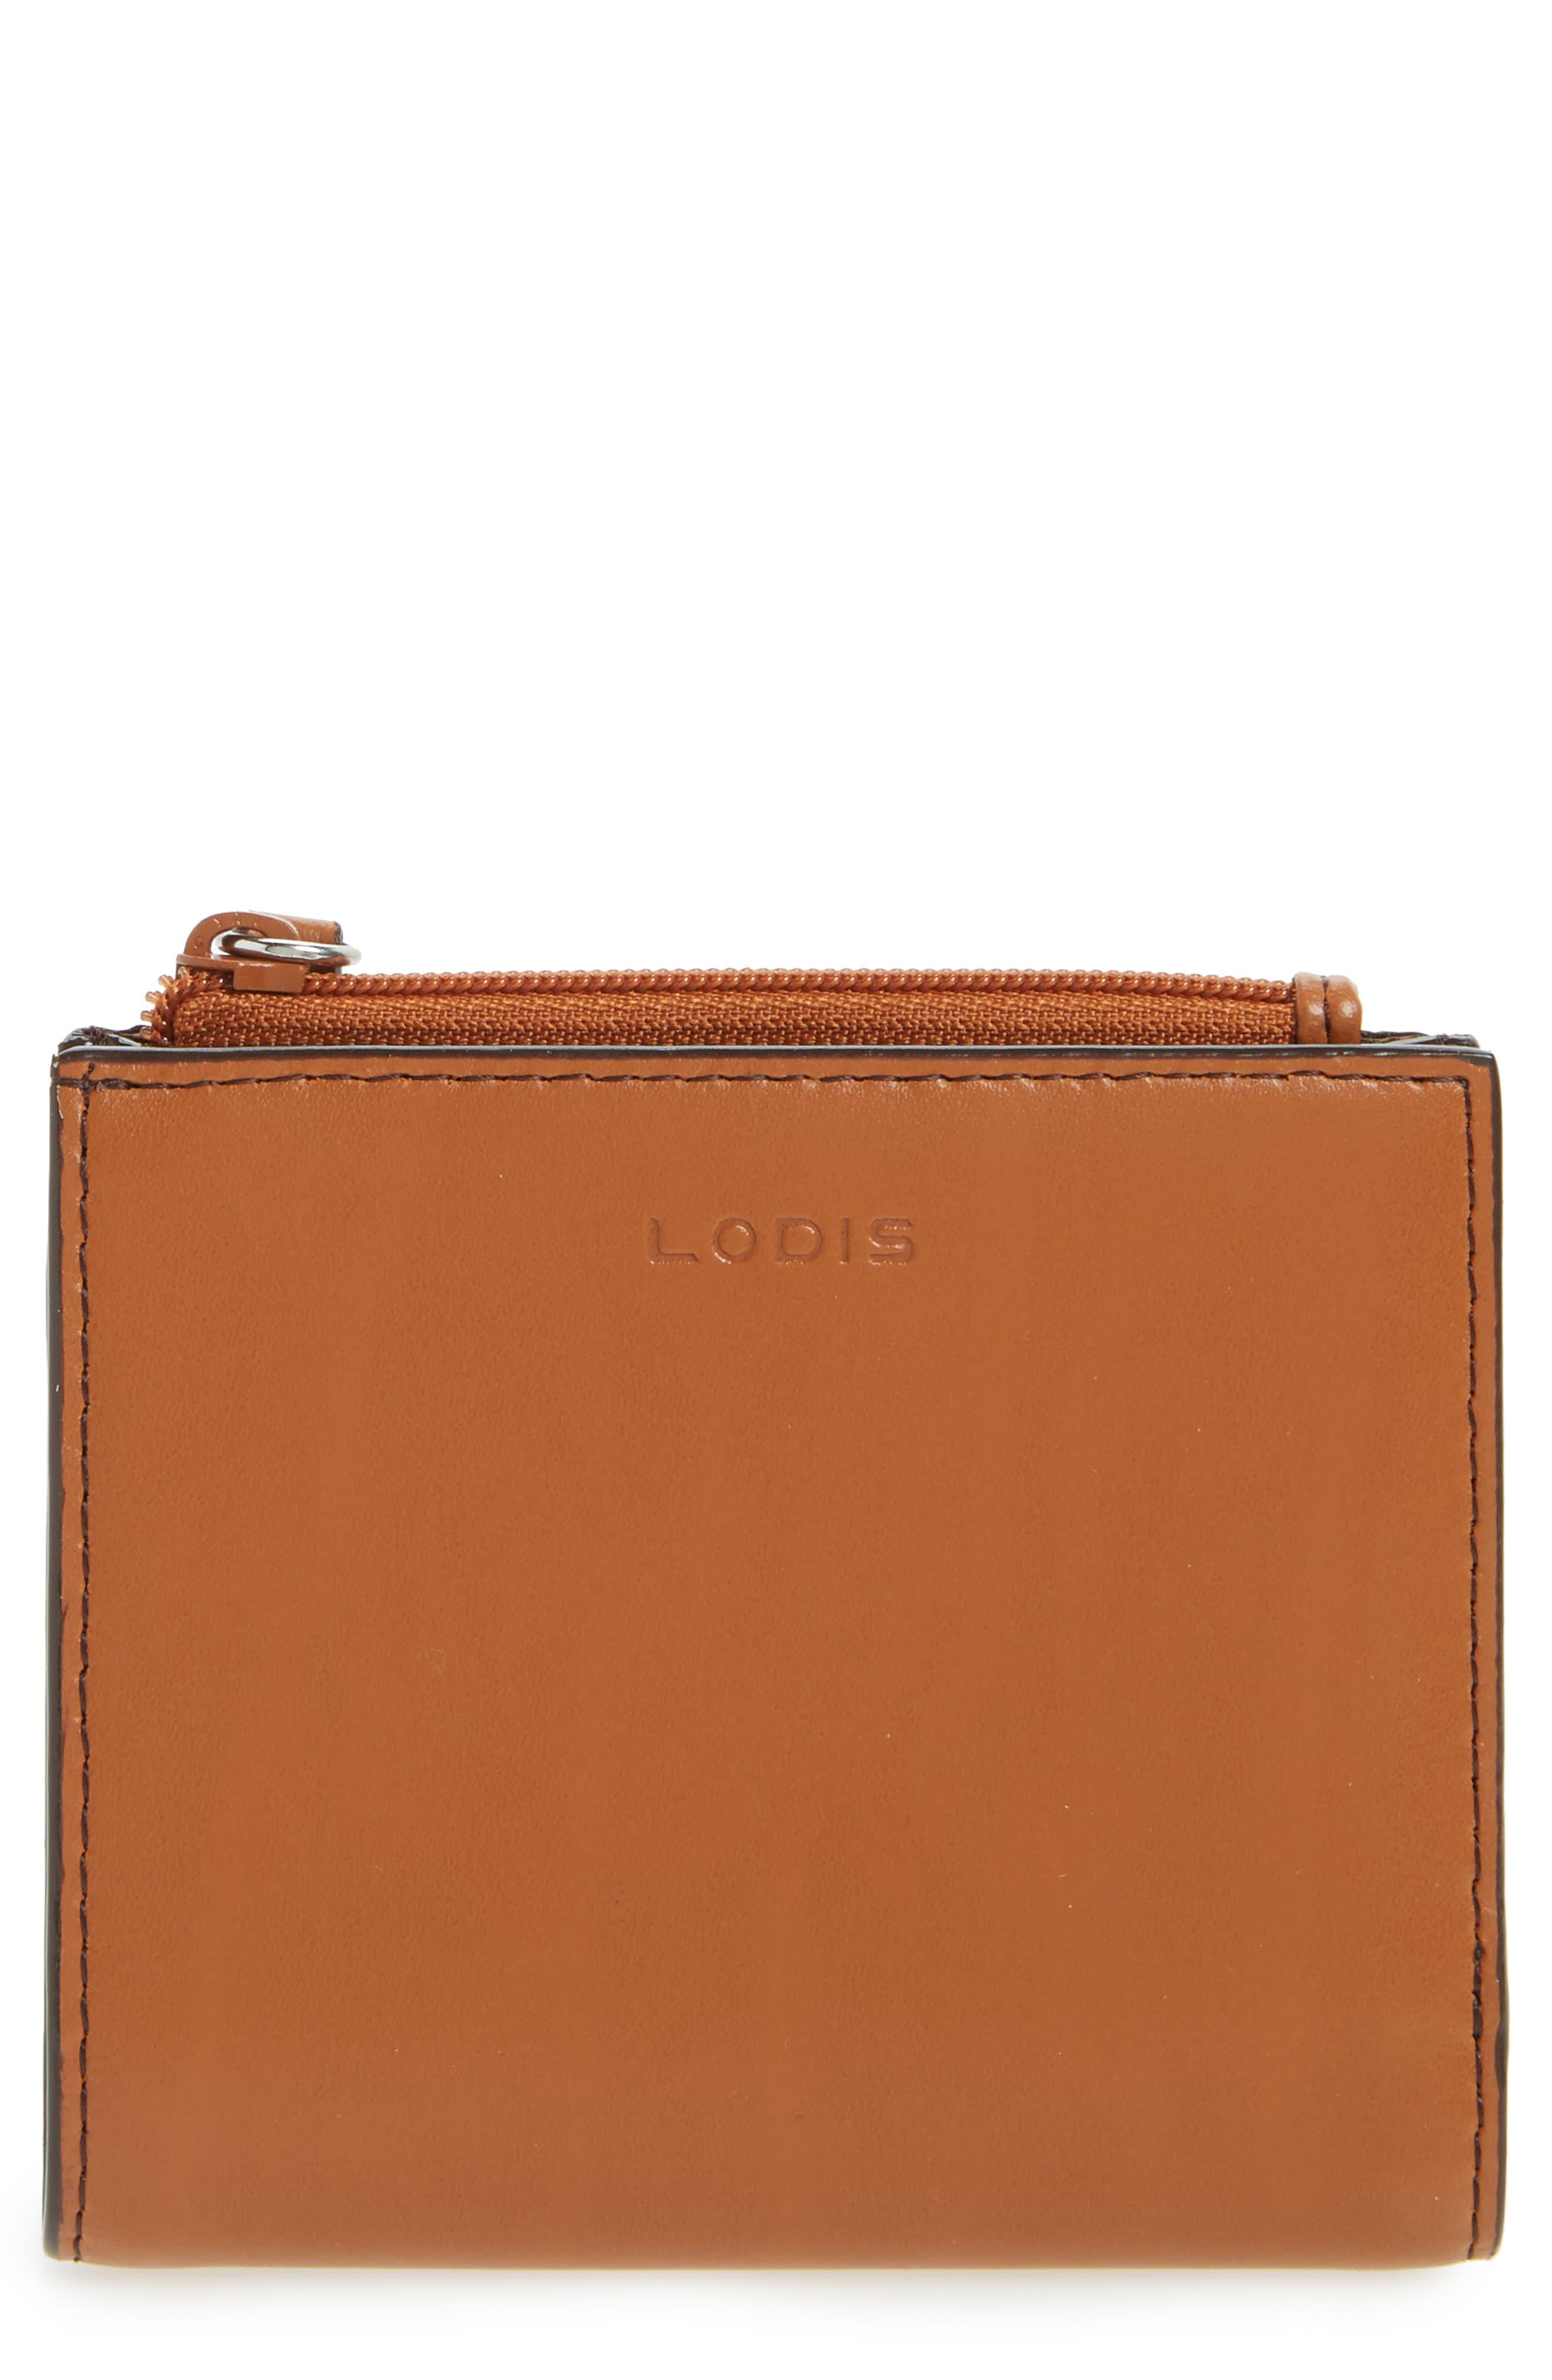 Main Image - LODIS Los Angeles Audrey Under Lock & Key Aldis Leather Wallet